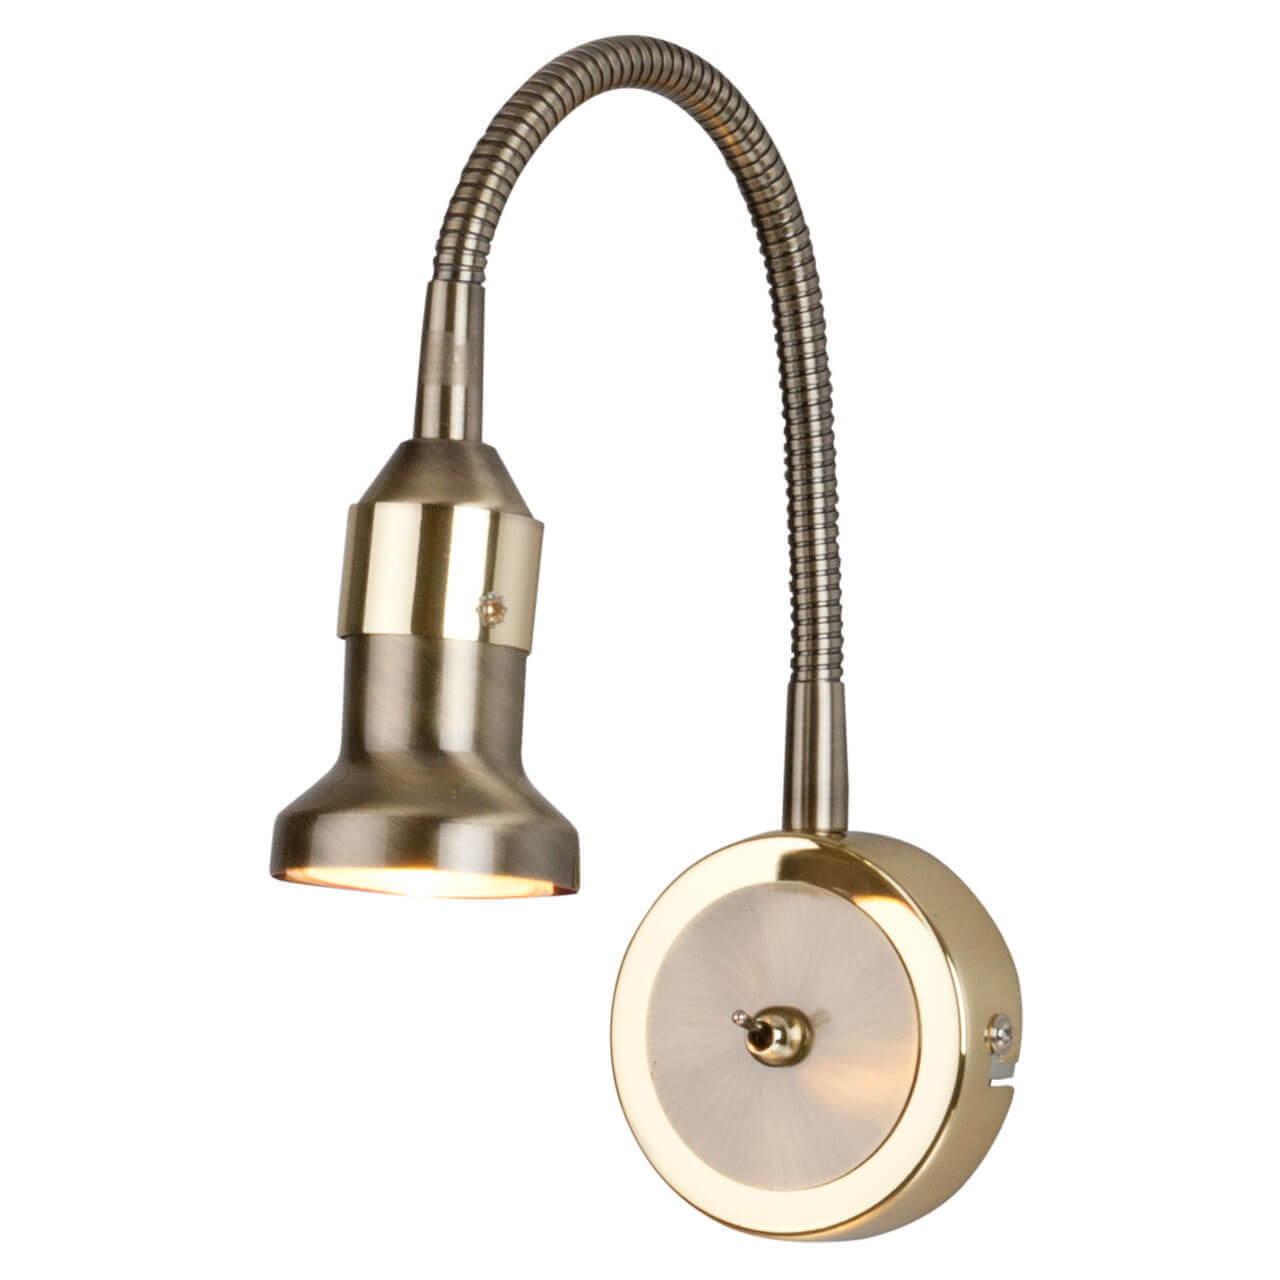 Подсветка для картин Elektrostandard Plica 1215 MR16 бронза/золото 4690389012105